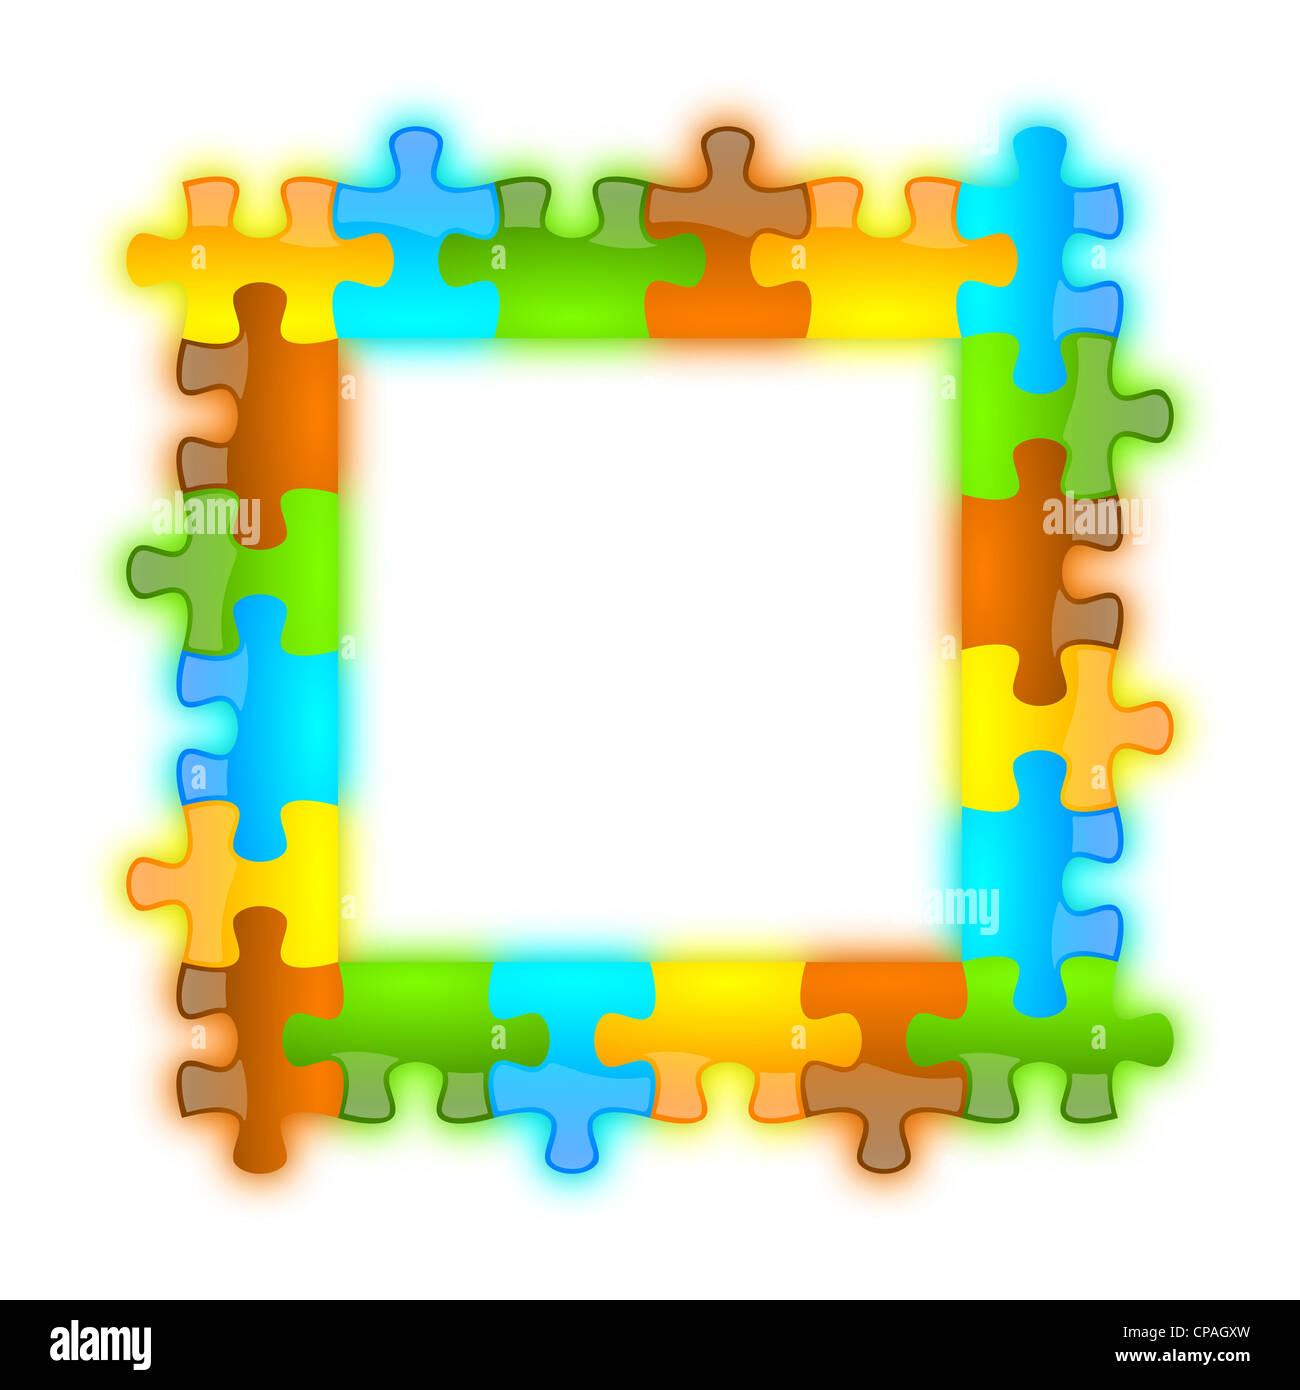 6 X 6 Imágenes De Stock & 6 X 6 Fotos De Stock - Alamy